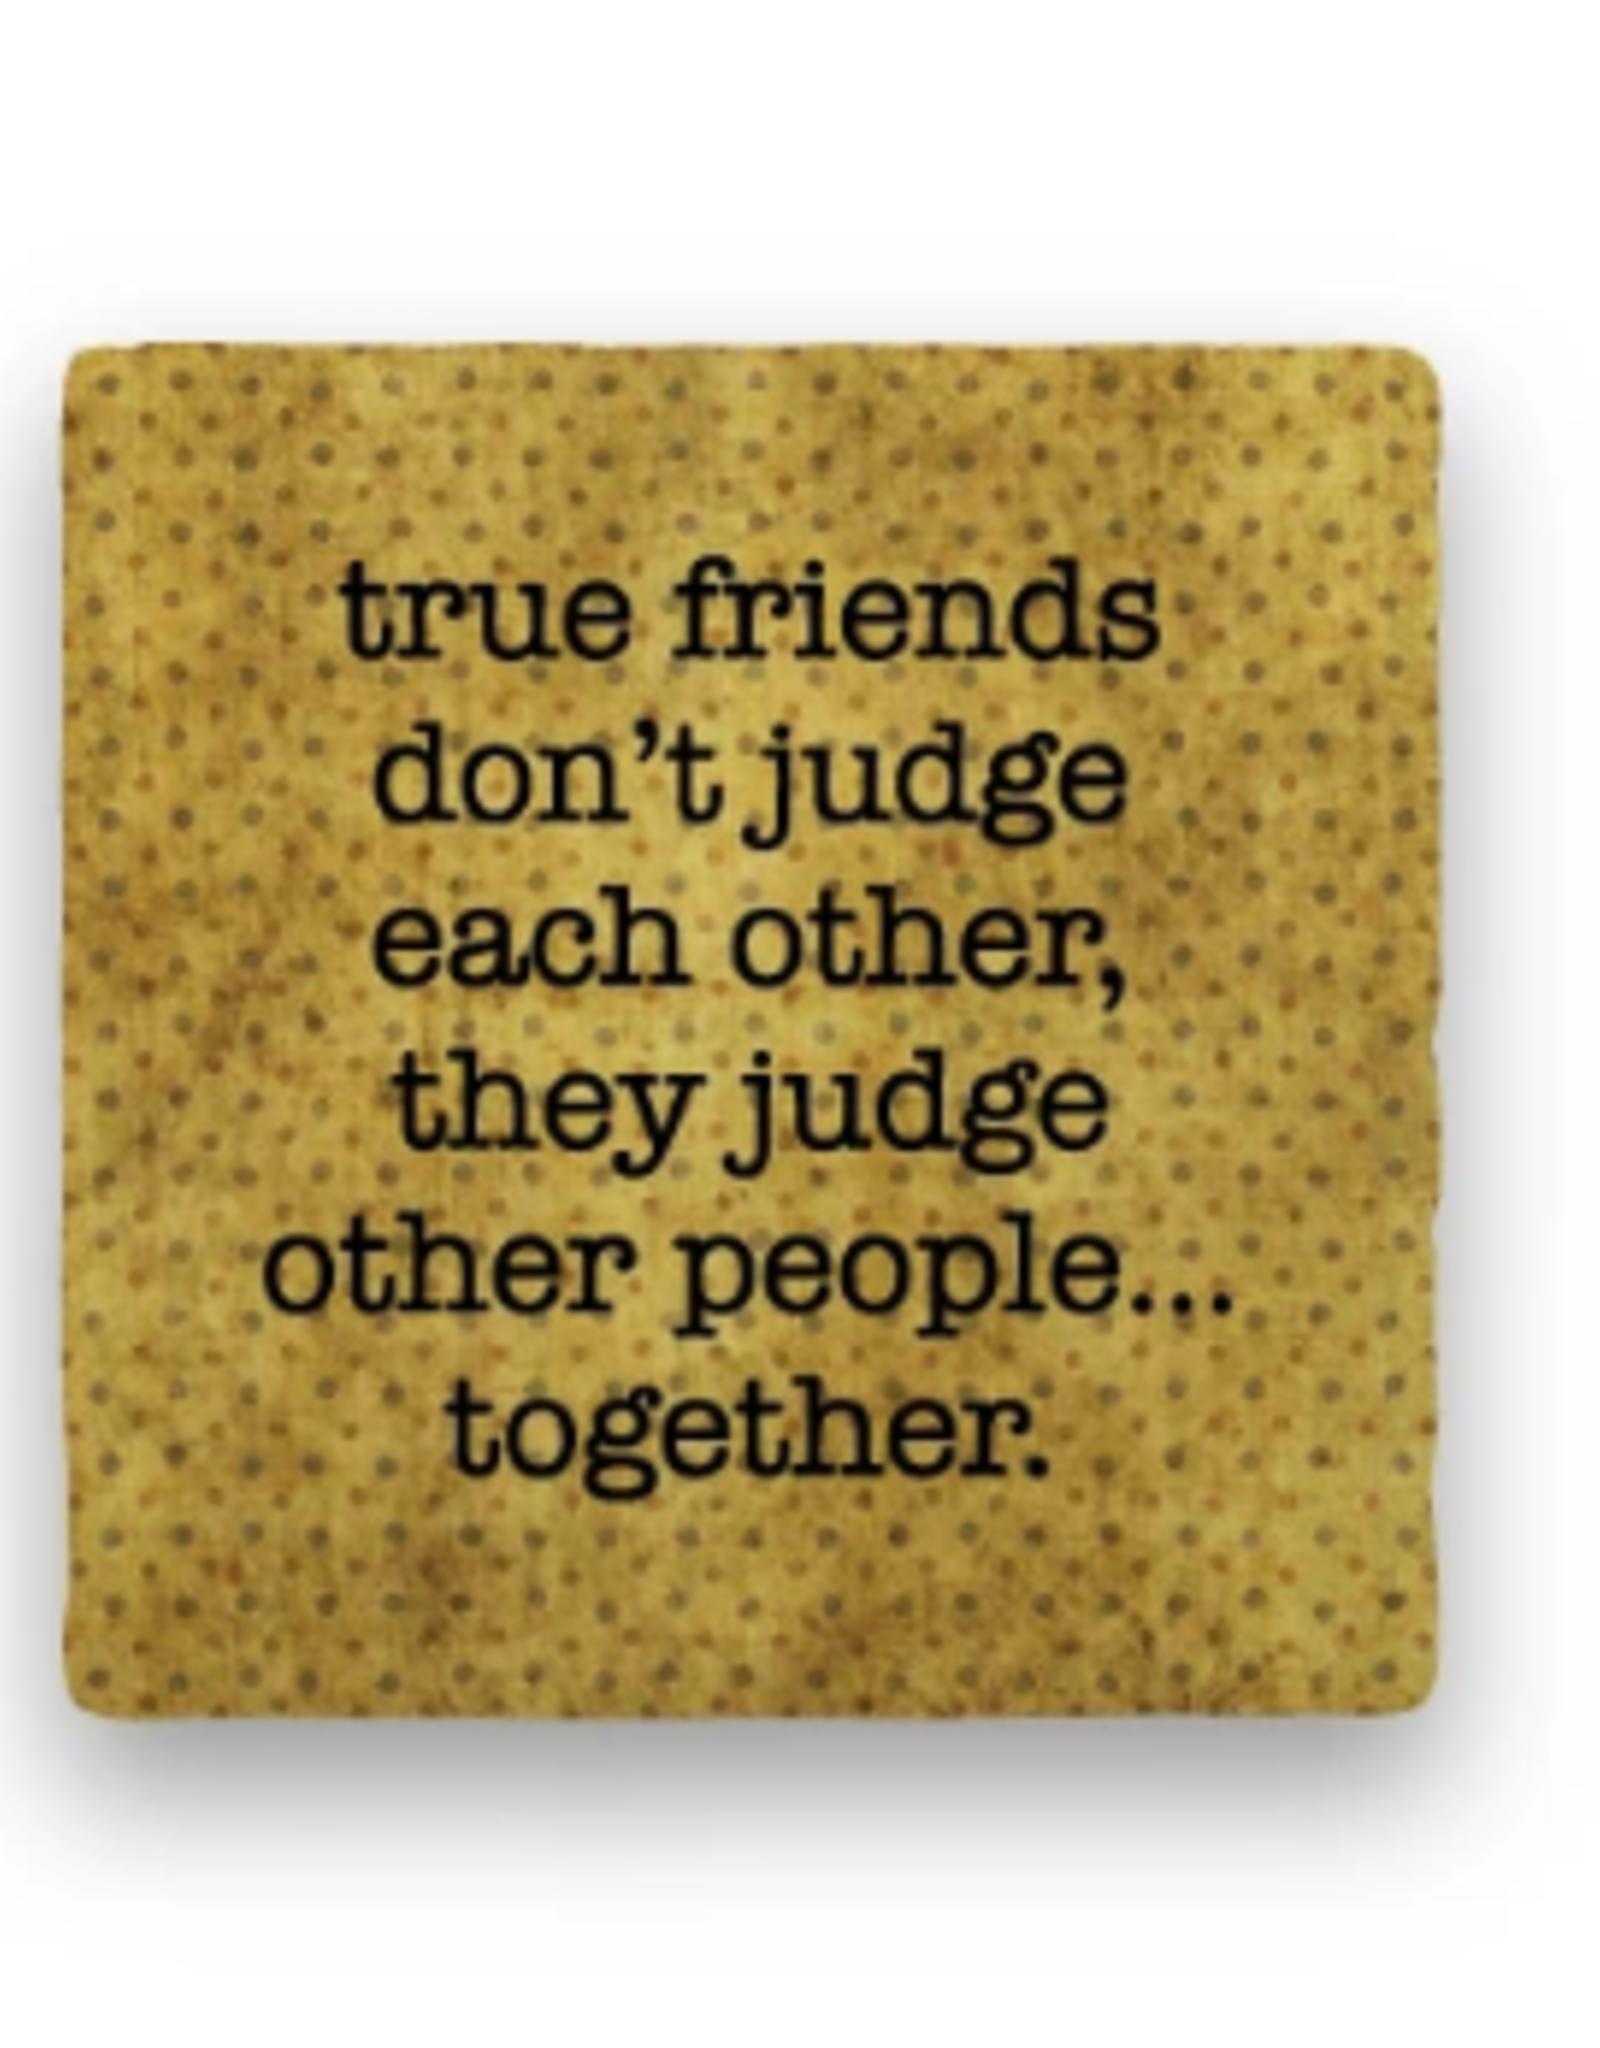 Paisley & Parsley Designs Coaster, True Friends